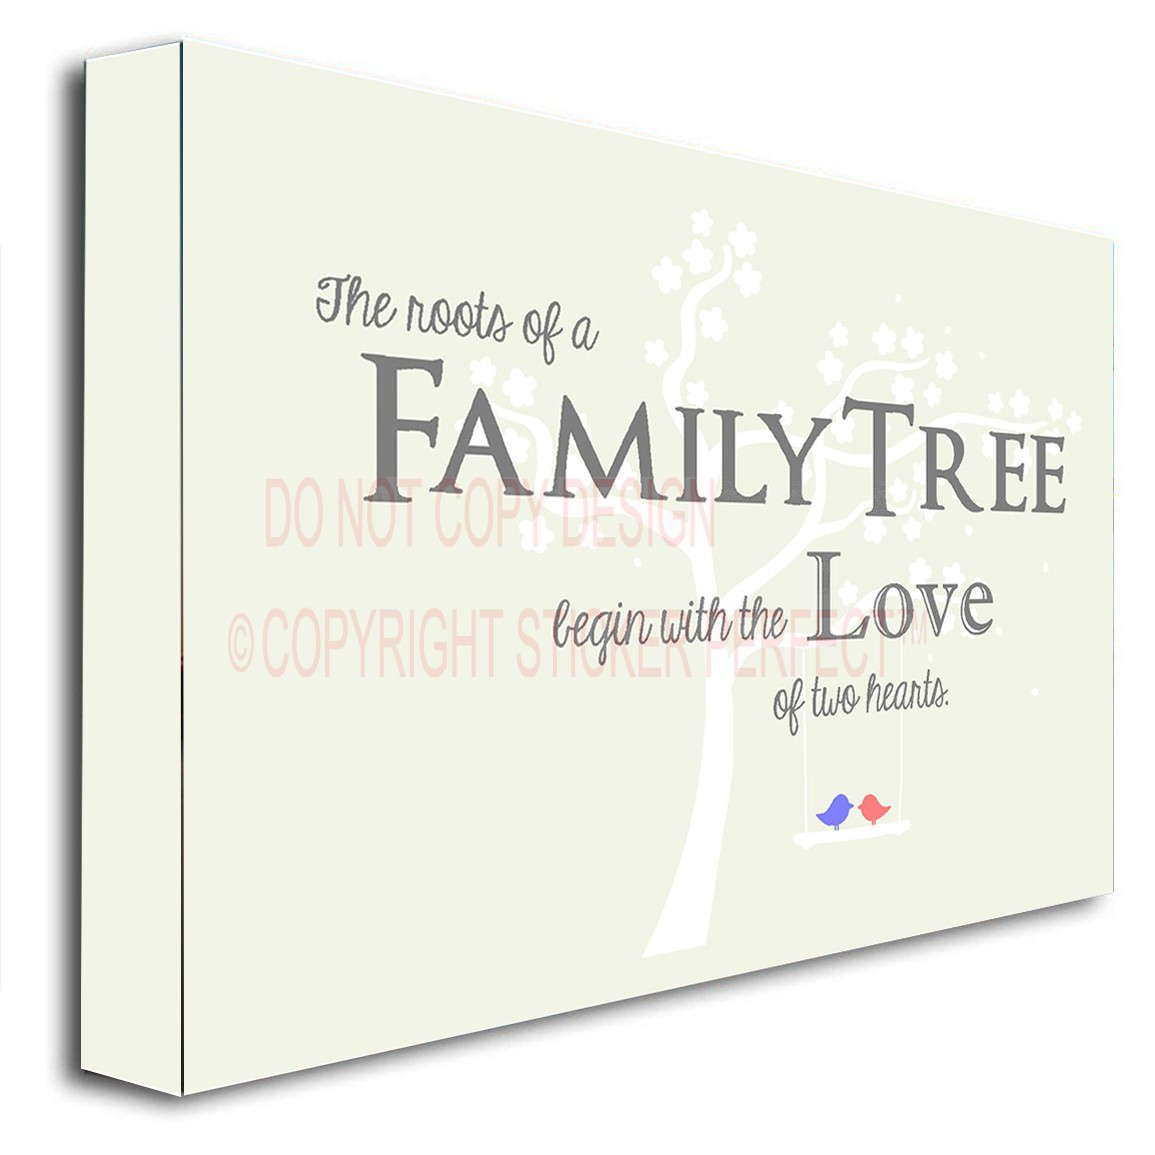 family tree quotes quotesgram